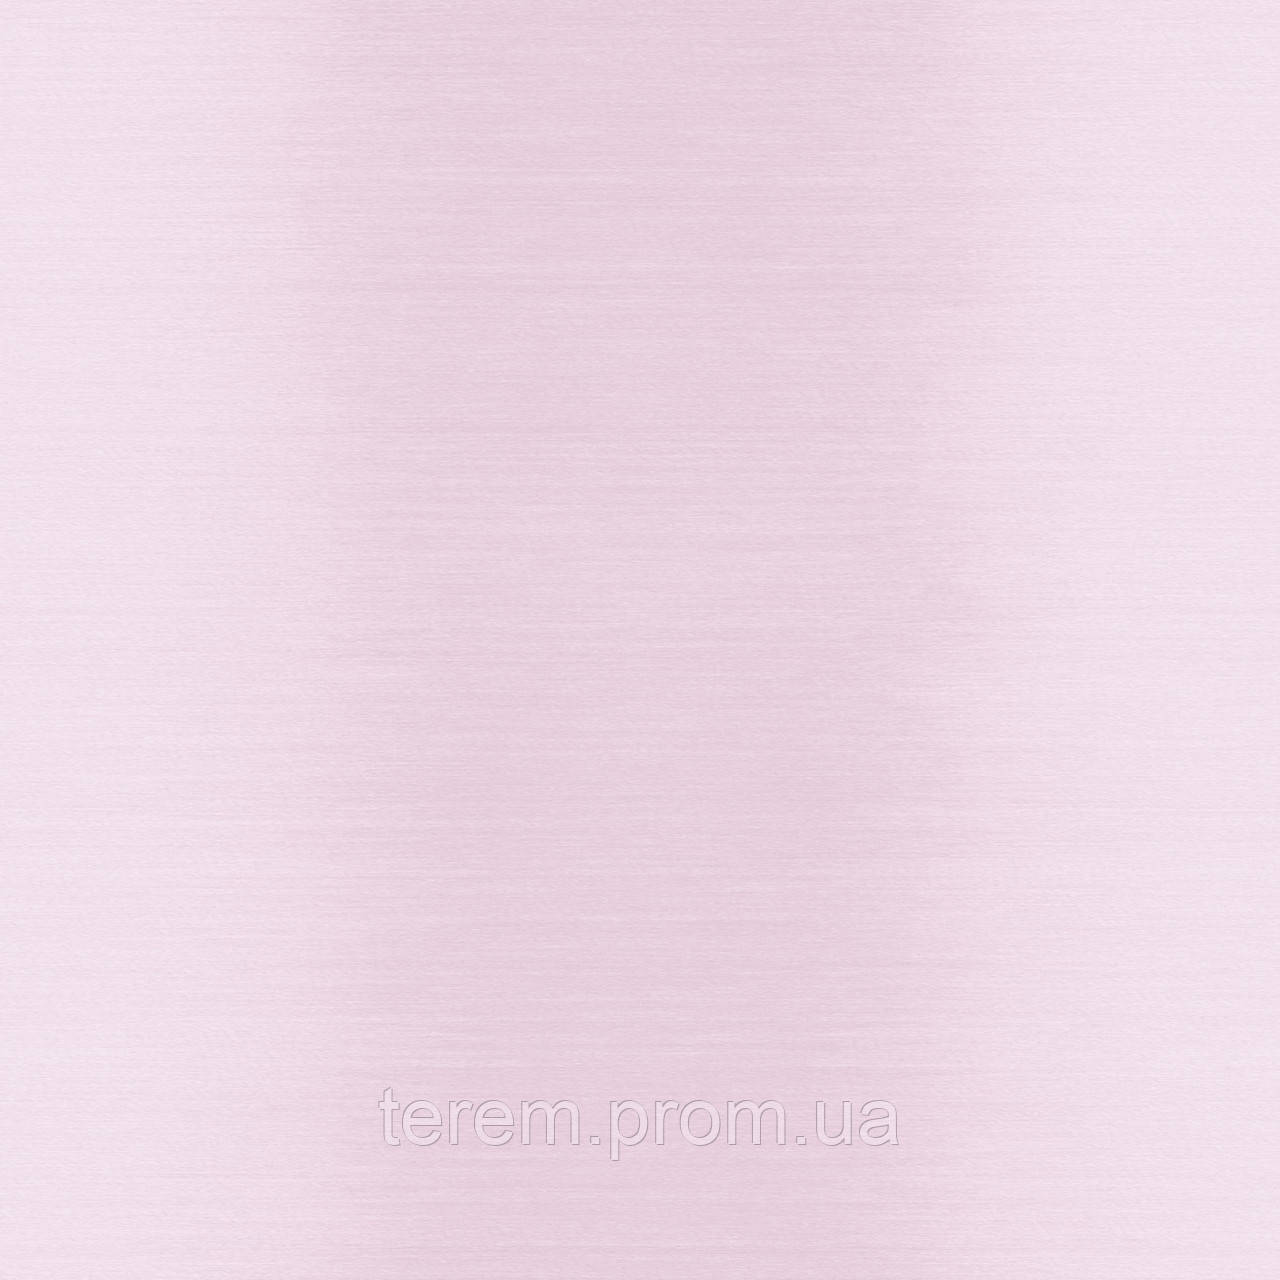 Vignette stripe pink